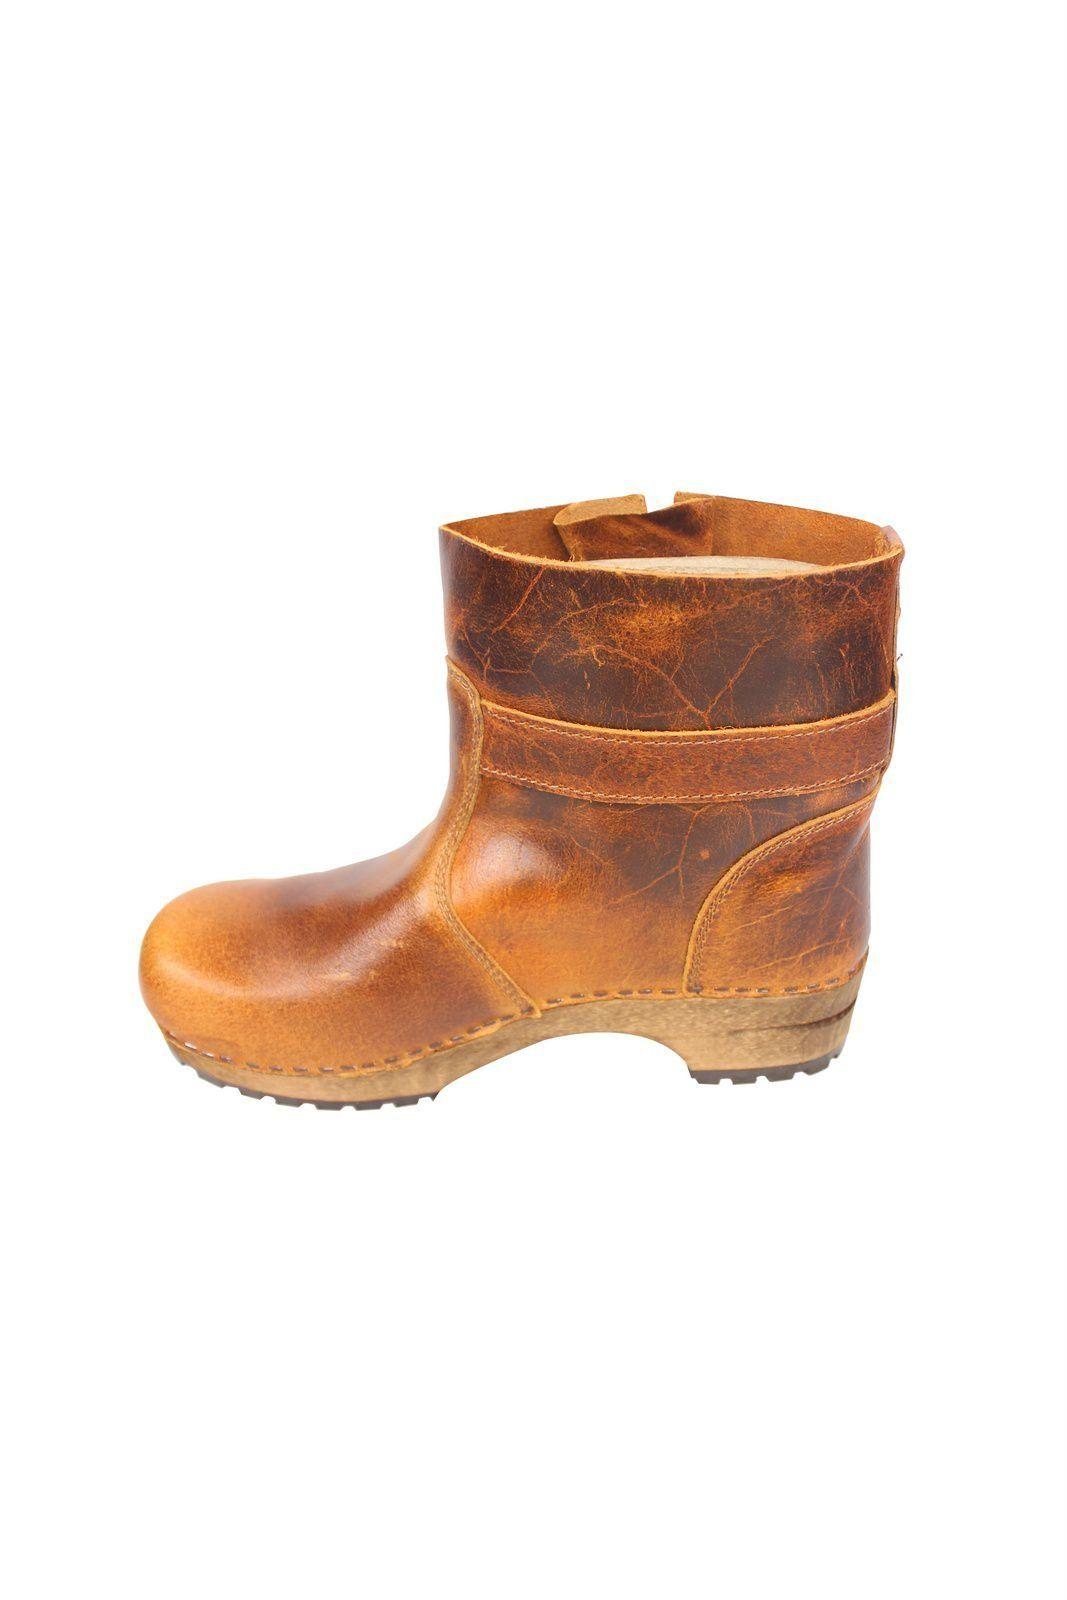 Mina Low Classic Clog Boot Cognac 452330 Rev Side 2